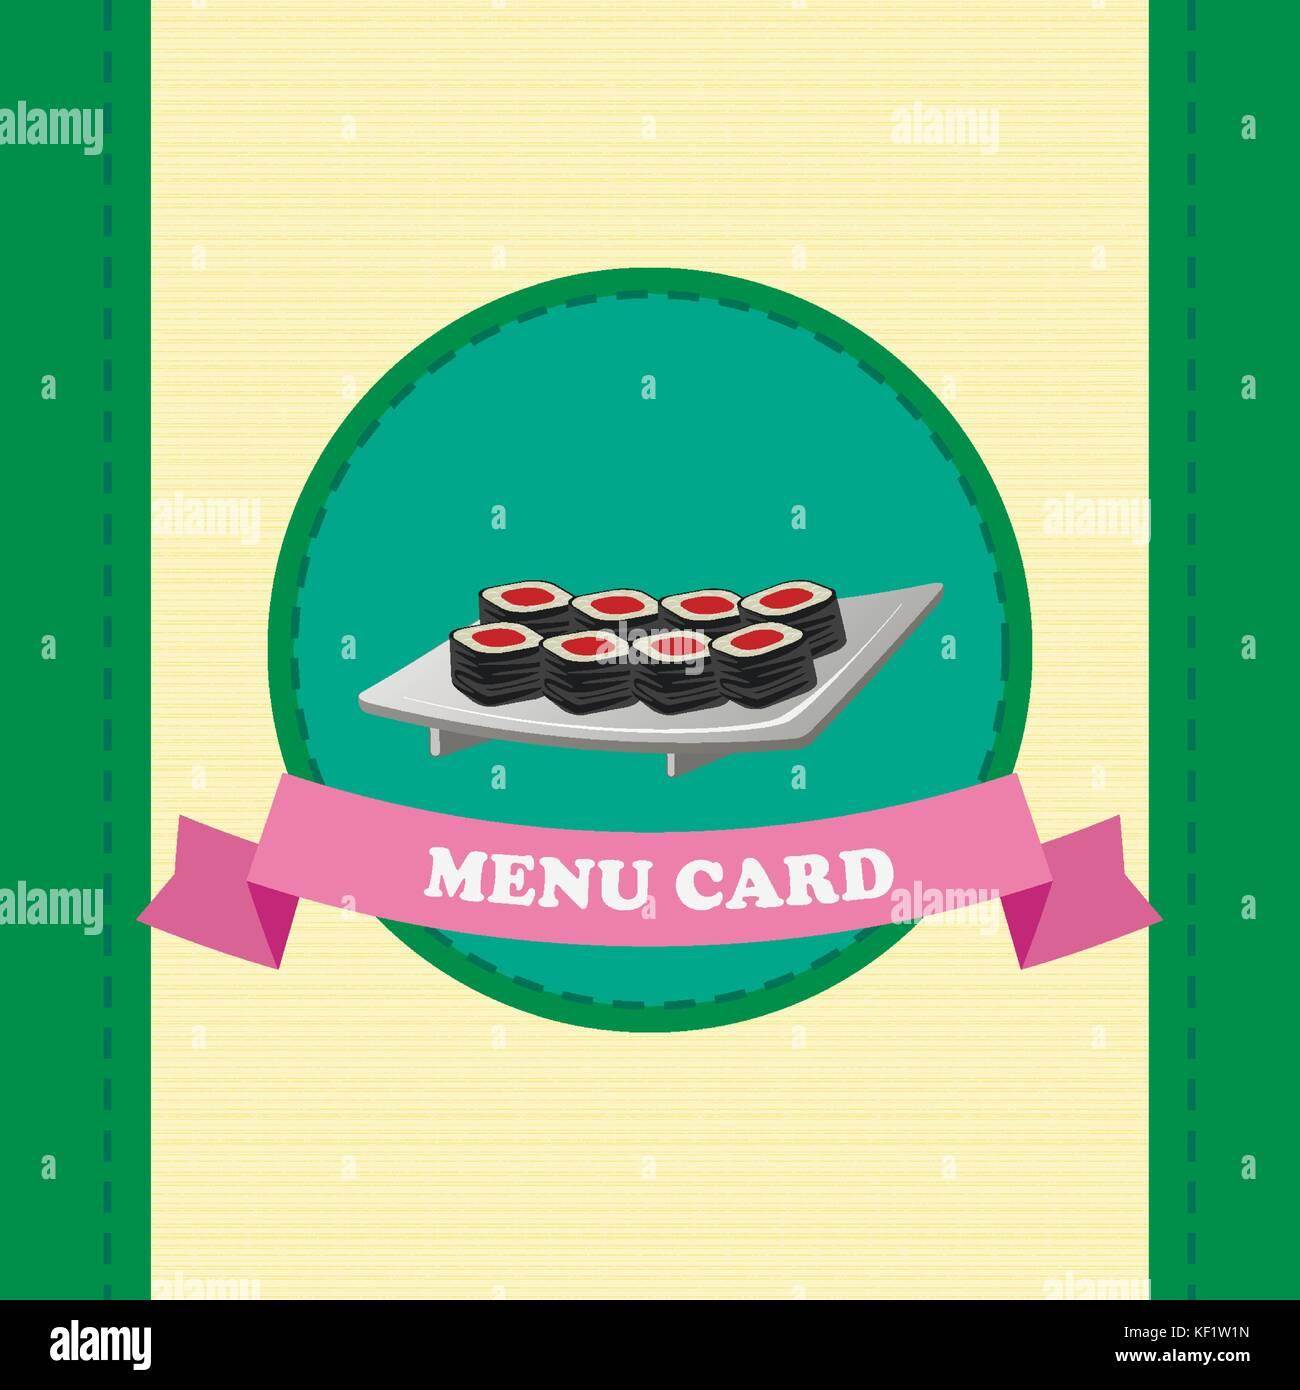 Imperial Cafe Sushi Menu